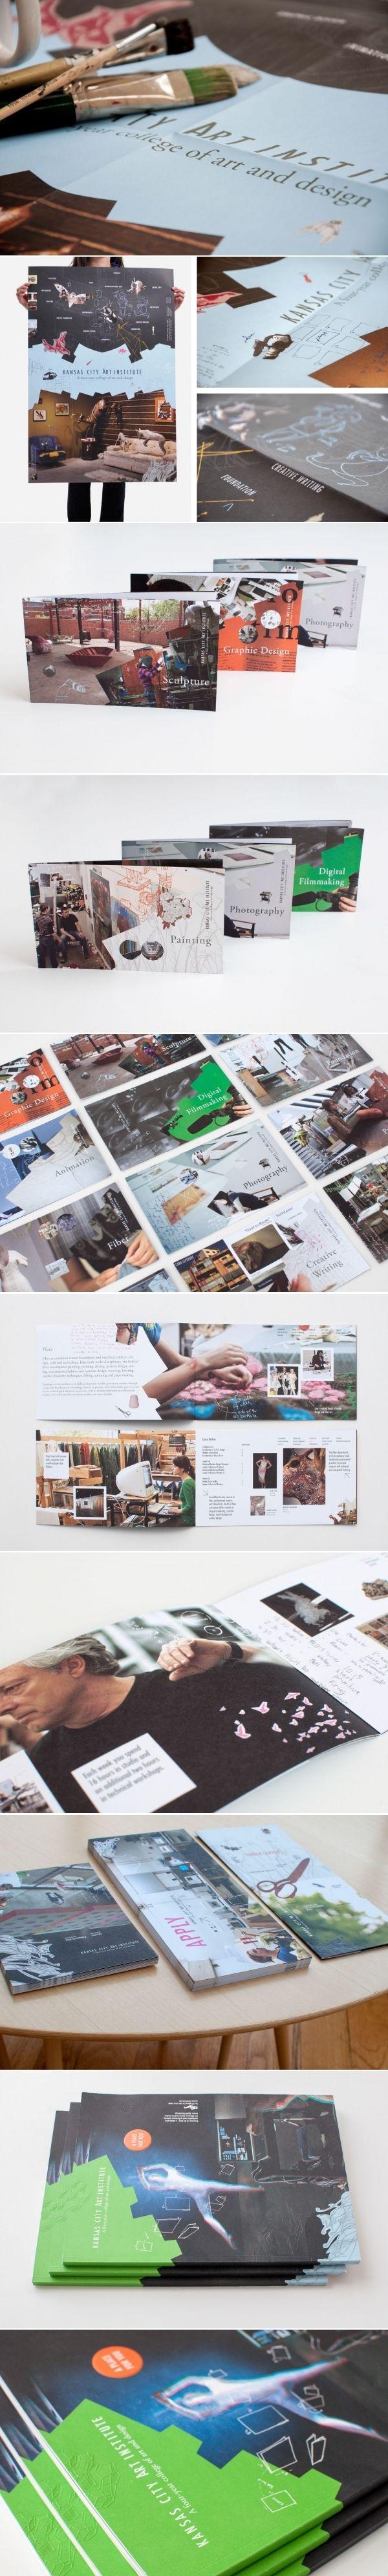 Kansas City Art Institute | Art Direction, Design, Marketing Materials | Design Ranch